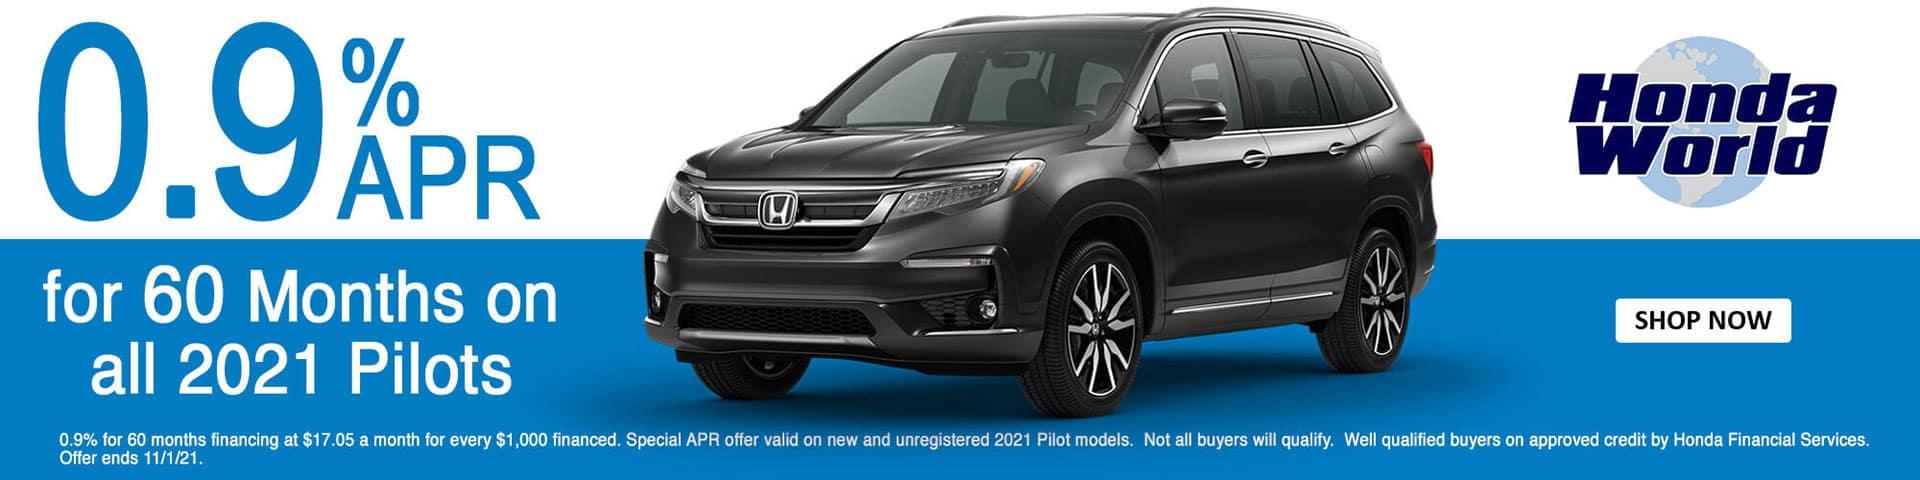 2021 Honda Pilot APR Offer